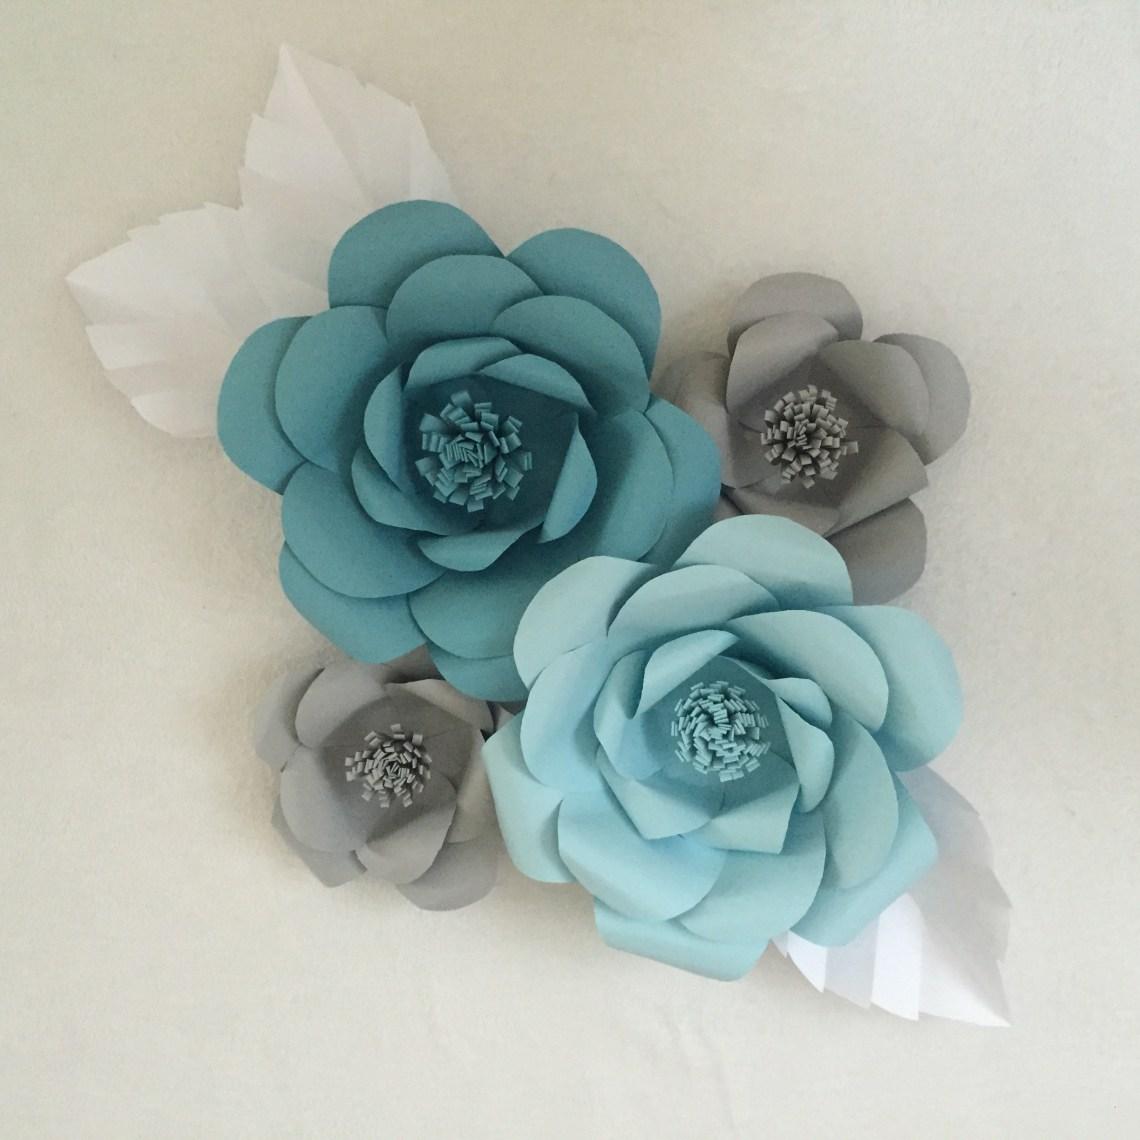 Paper Flower Backdrop, Paper Flower Wall - giant paper flowers | ashandcrafts.com